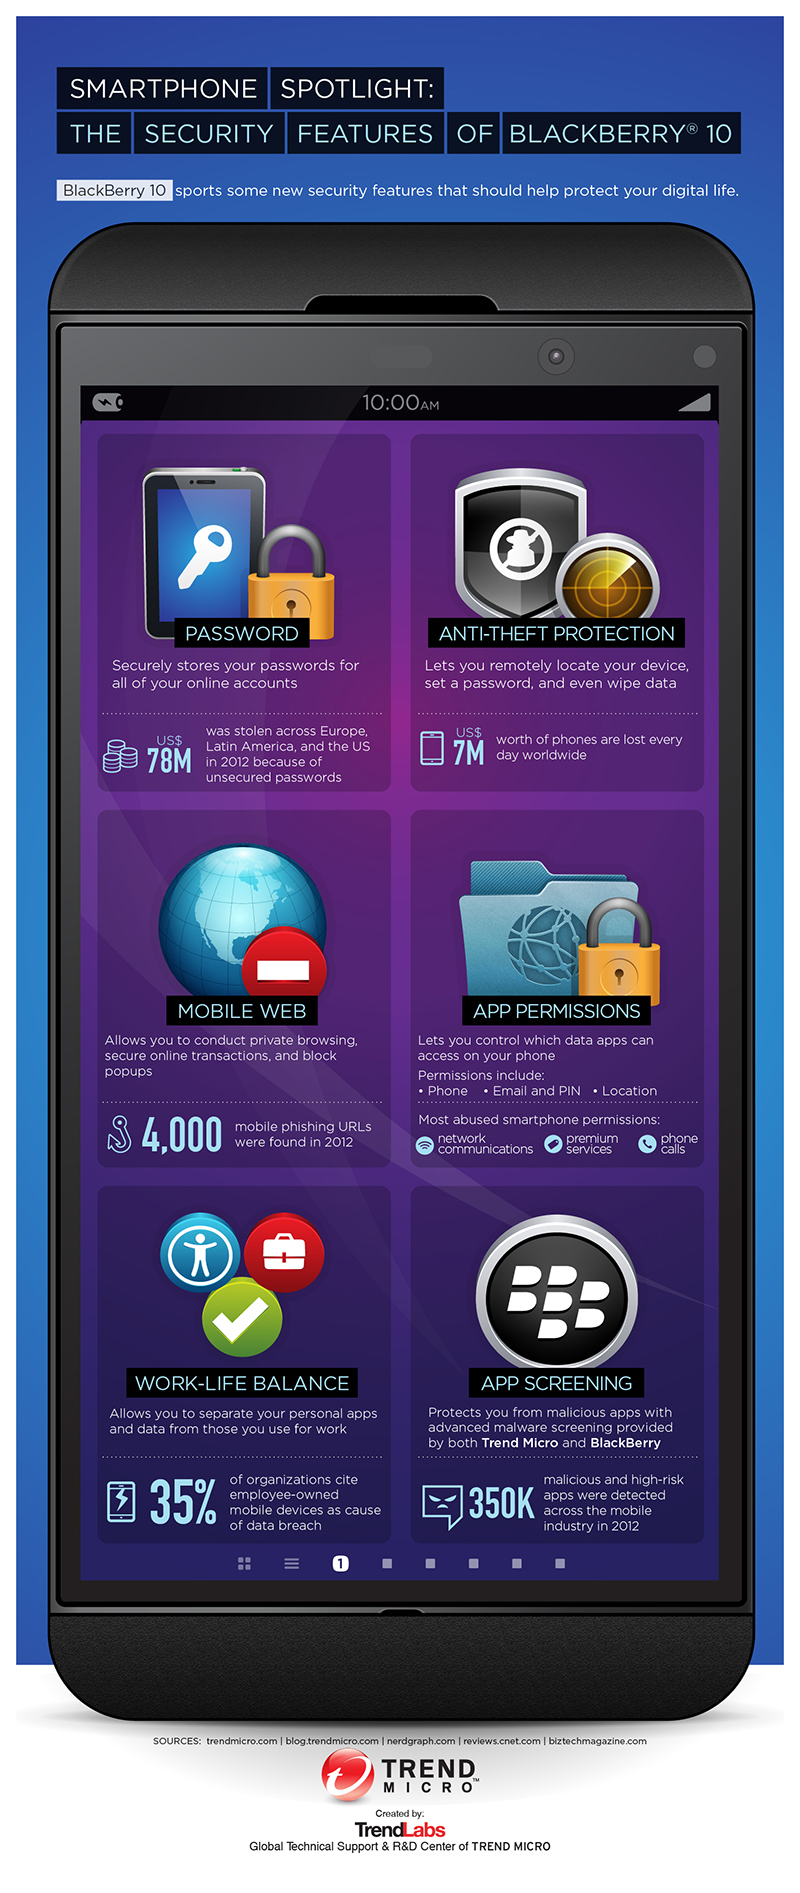 Smartphone Spotlight